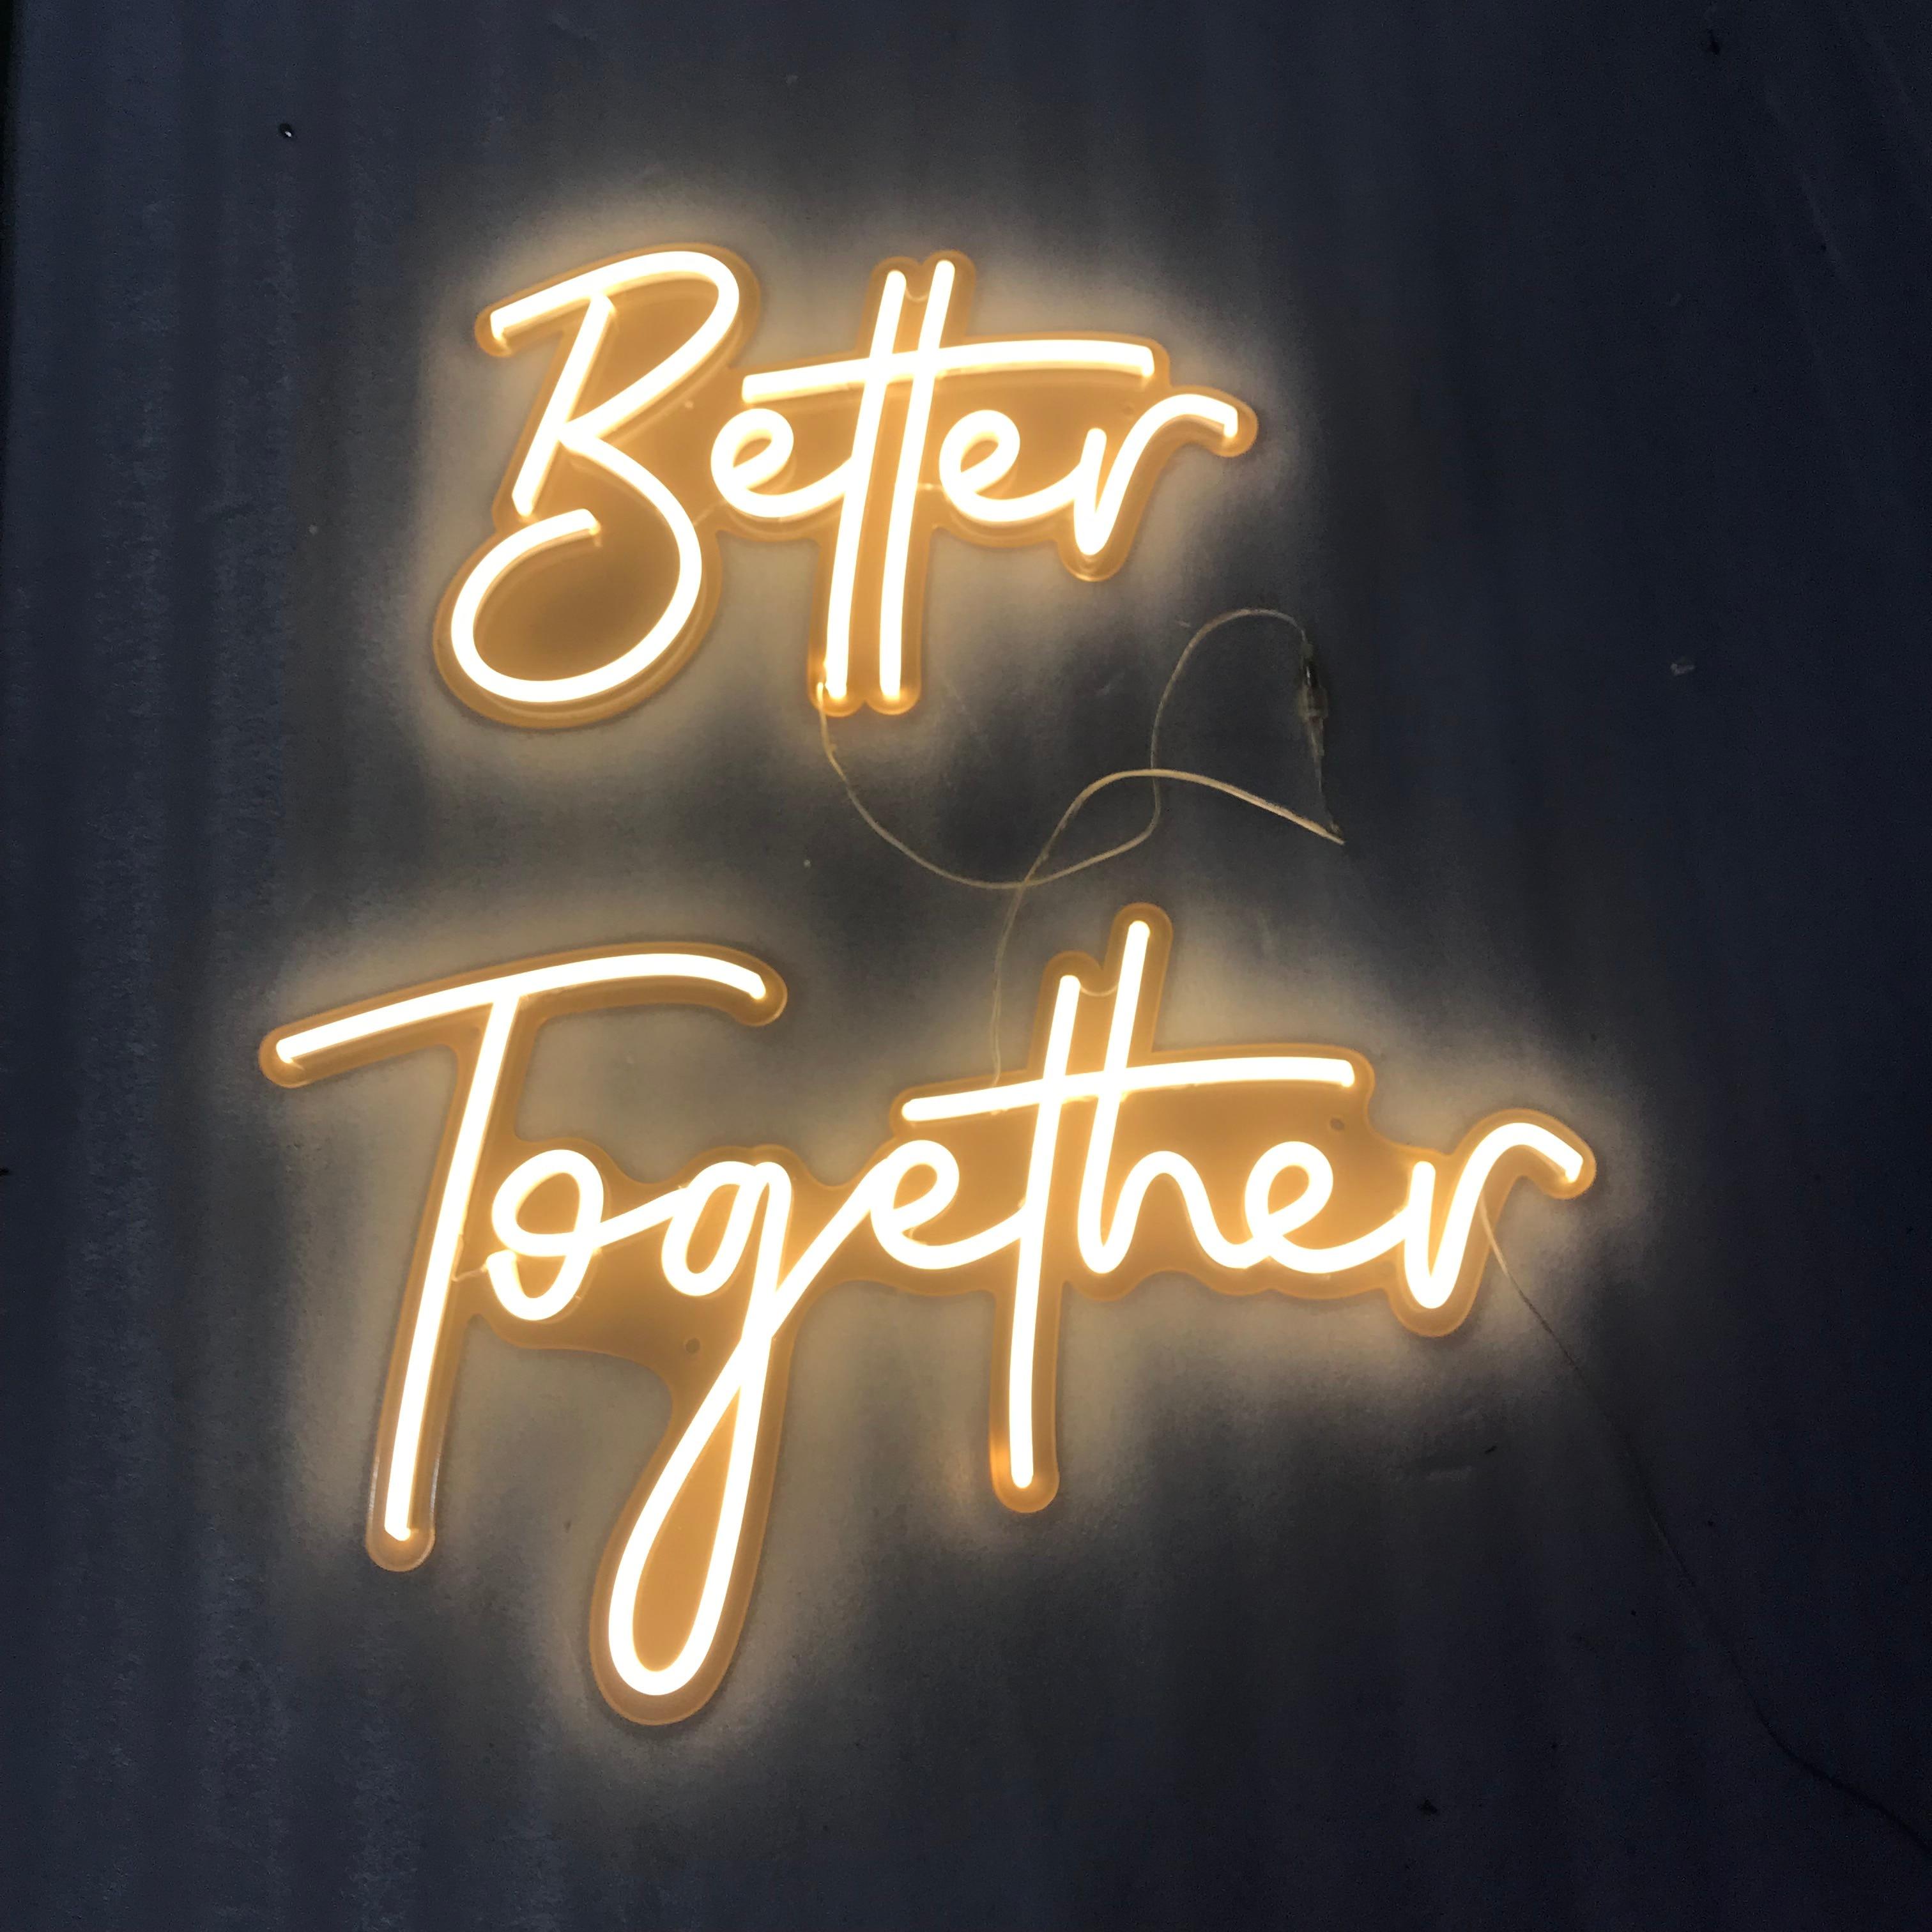 Custom Flex Led  Better Together 12V  Wedding Party Decoration Bedroom Home Wall Decor Use Indoor Outdoor enlarge